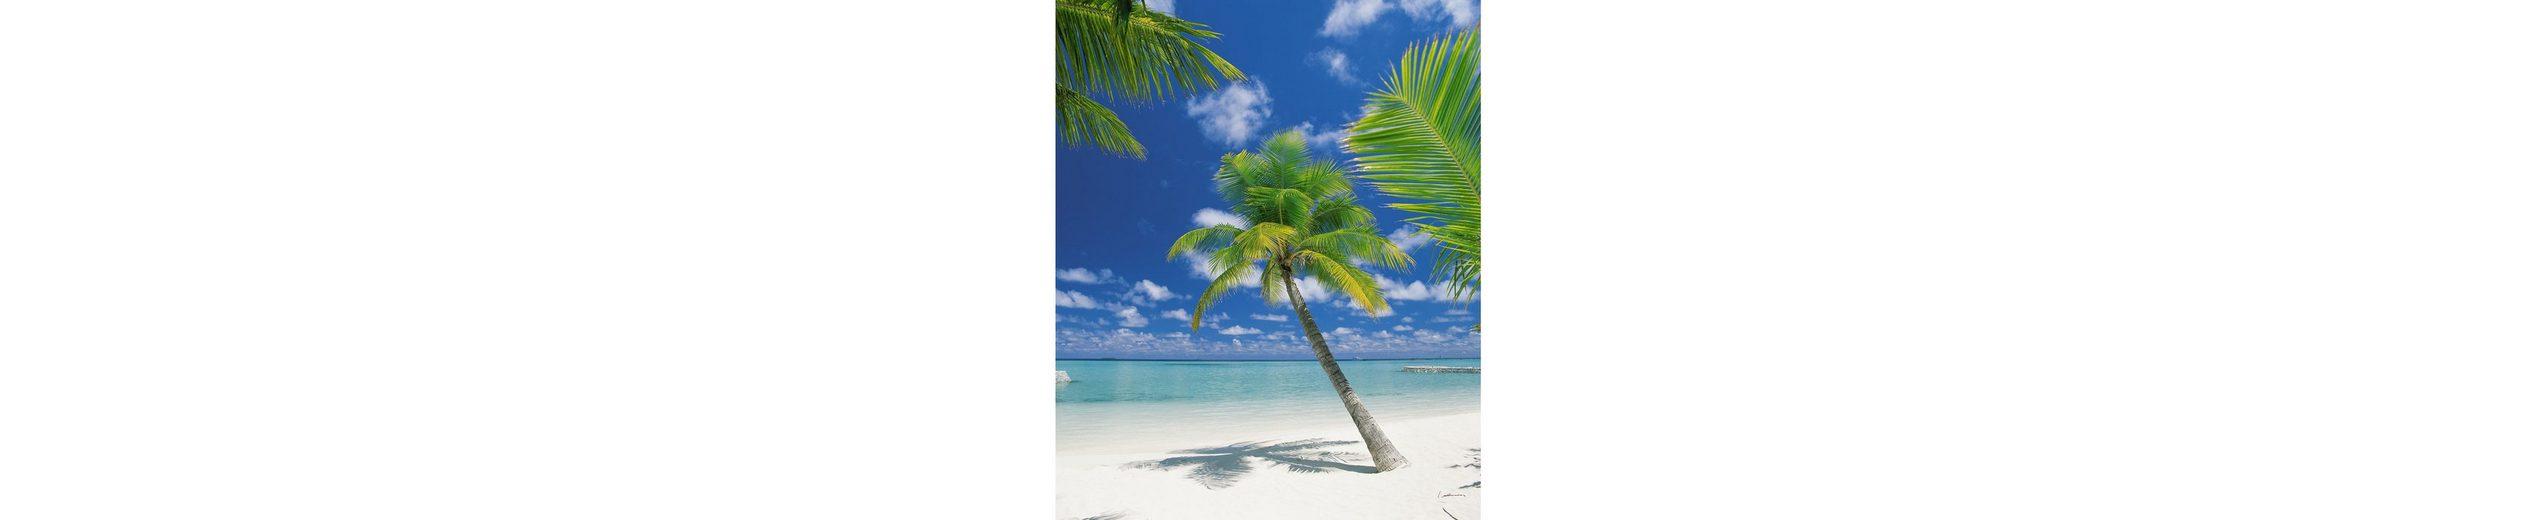 Fototapete, Komar, »Ari Atoll«, 184/254 cm